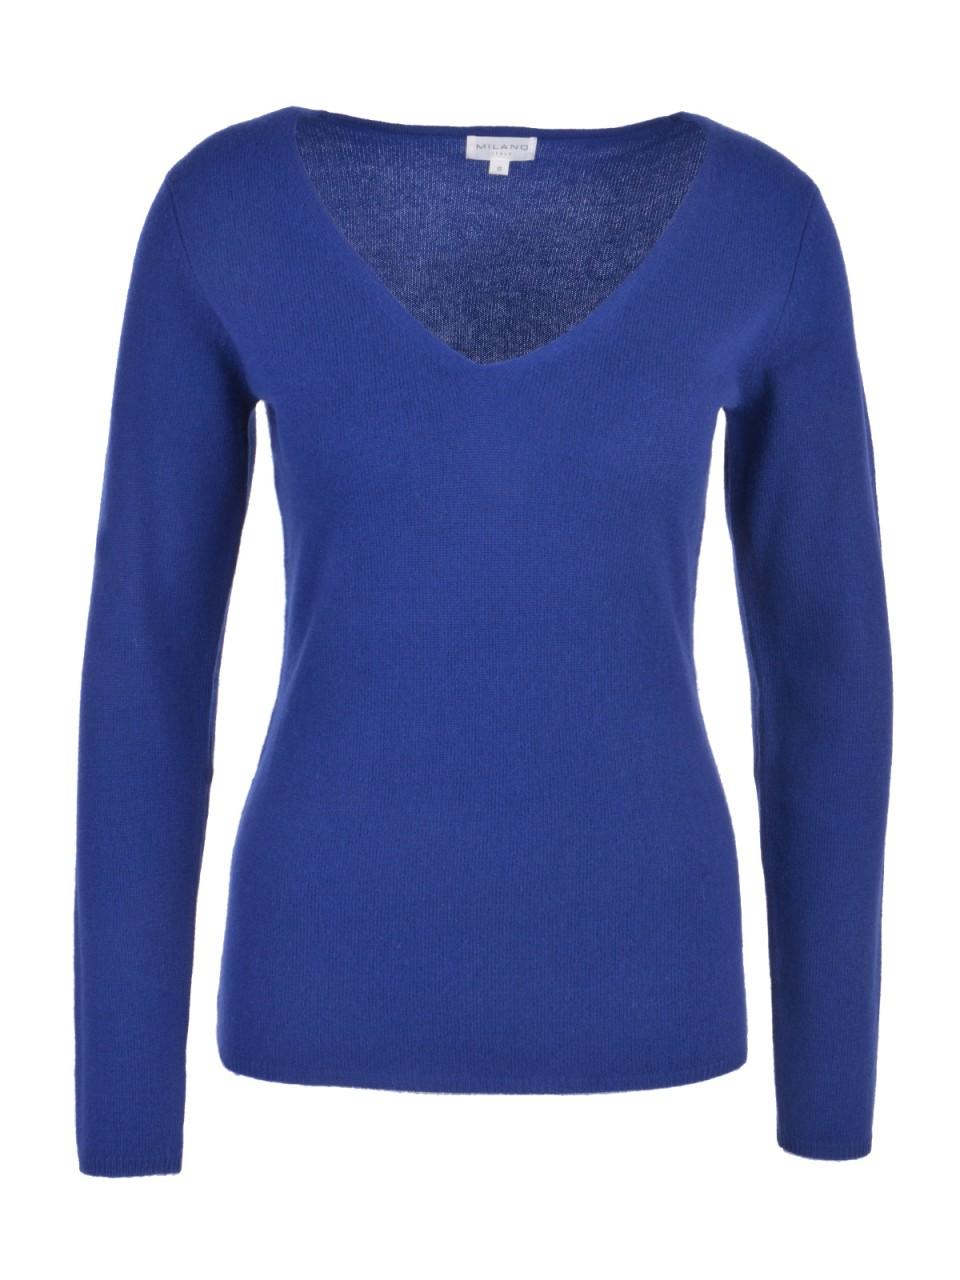 milano-italy-damen-kaschmir-pullover-blau